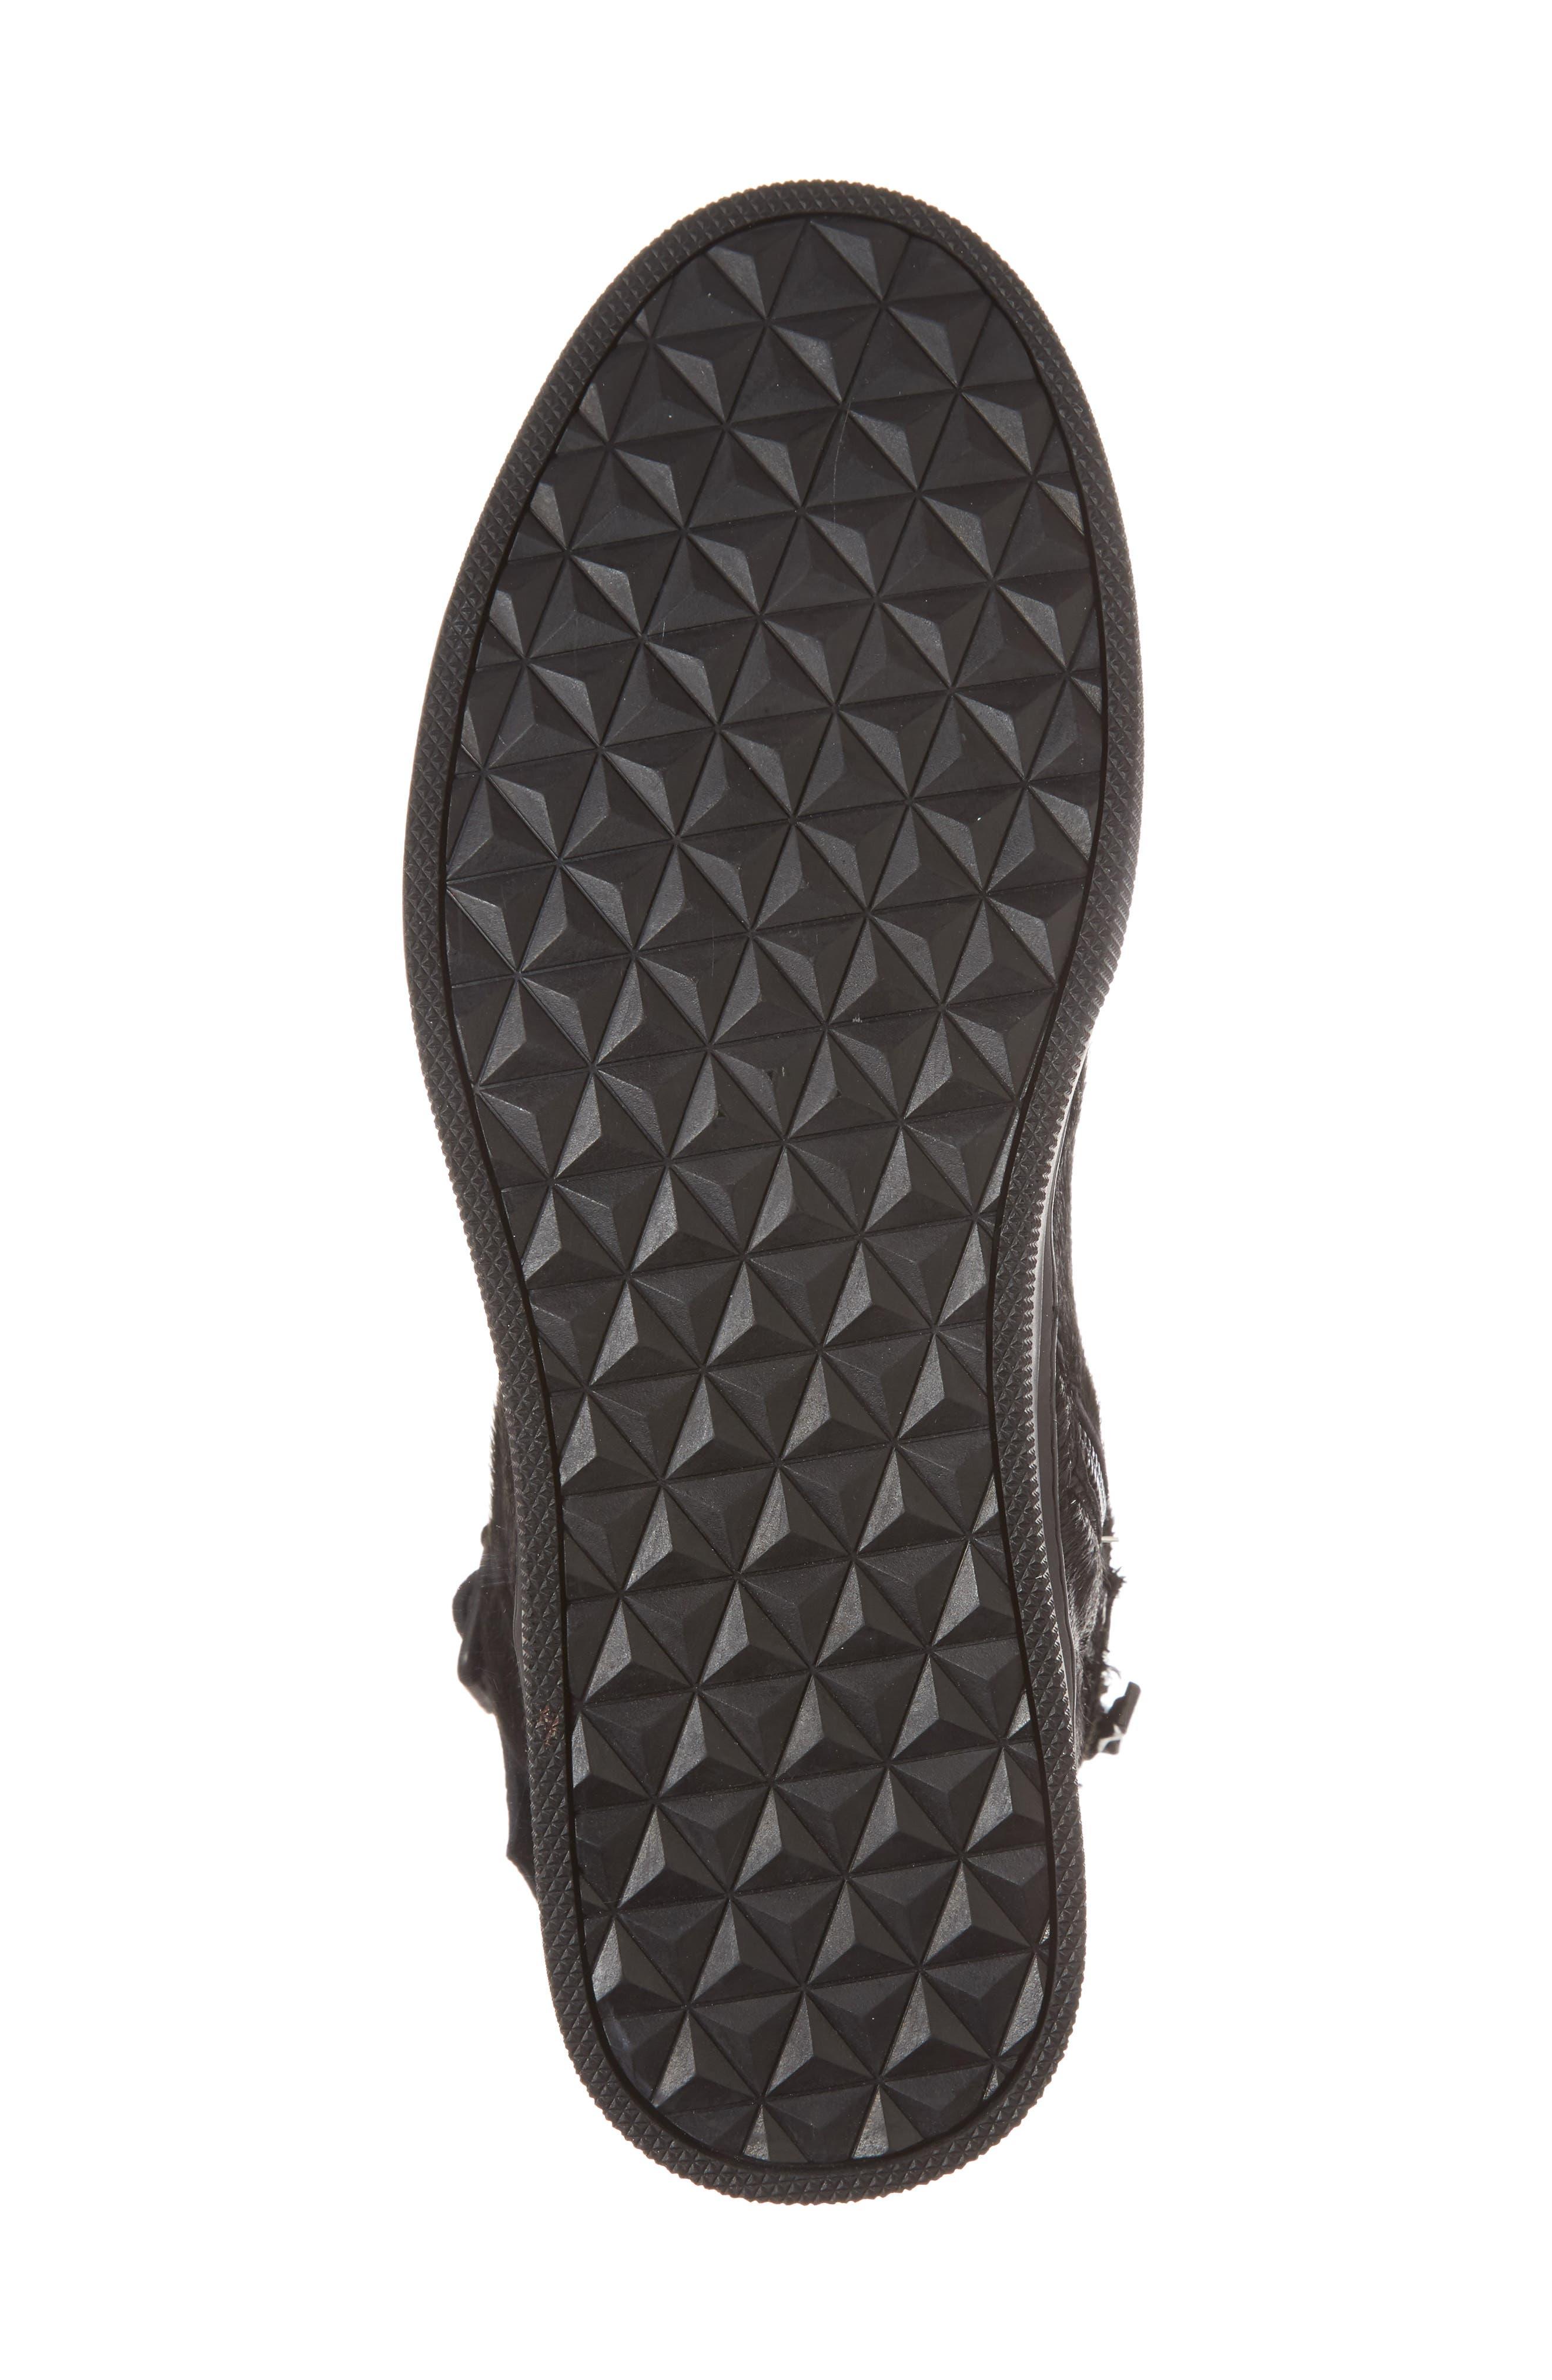 Sullivan Genuine Calf Hair High Top Sneaker,                             Alternate thumbnail 6, color,                             Black Fur Leather